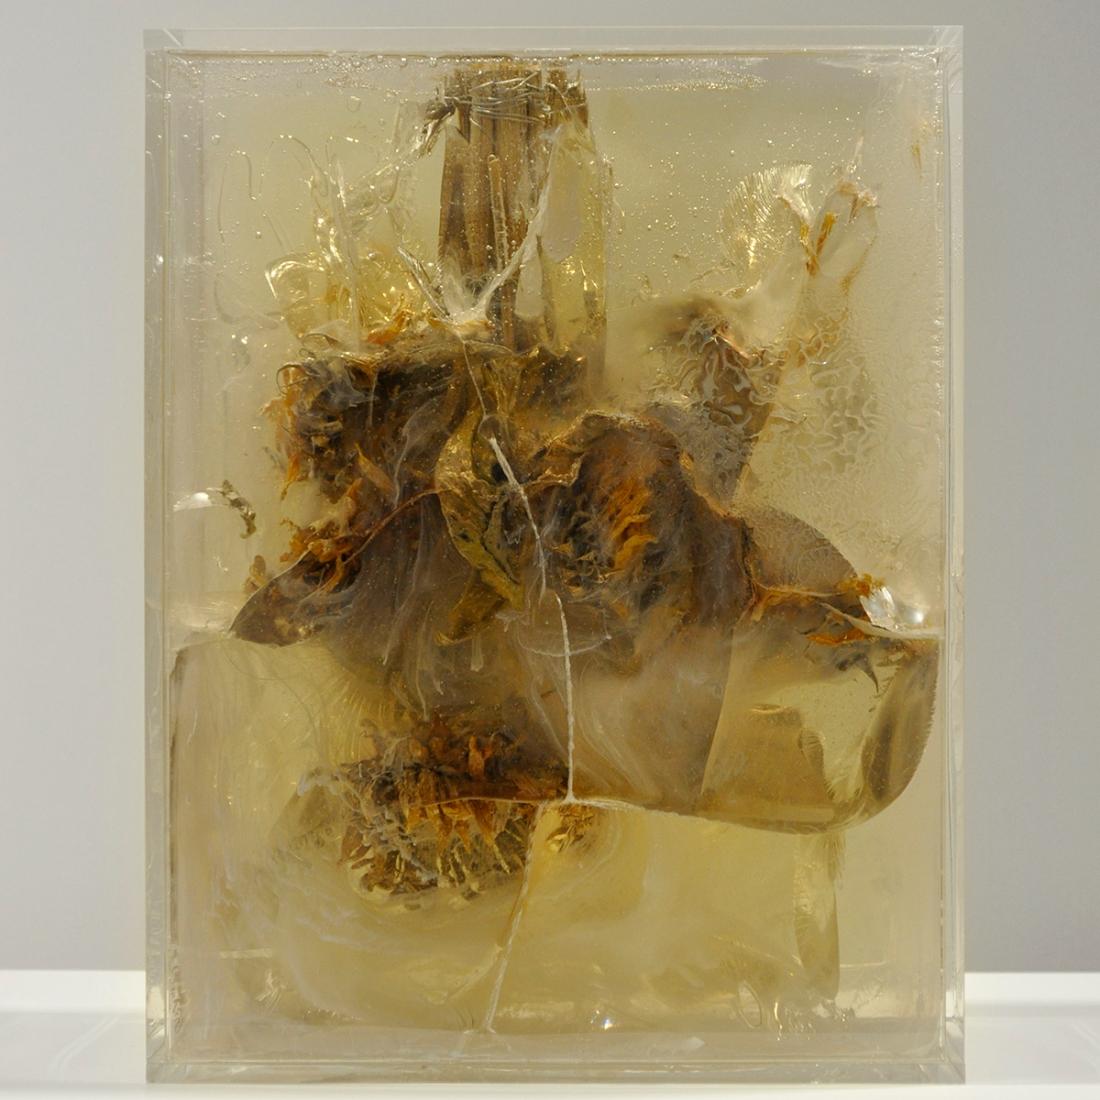 MADNESS Auringonkukat, pigmentti, akrylihartsi, akrylilasi Sunflowers, pigment, clear cast resin, plexi glass 31 x 24 x 10cm 2016